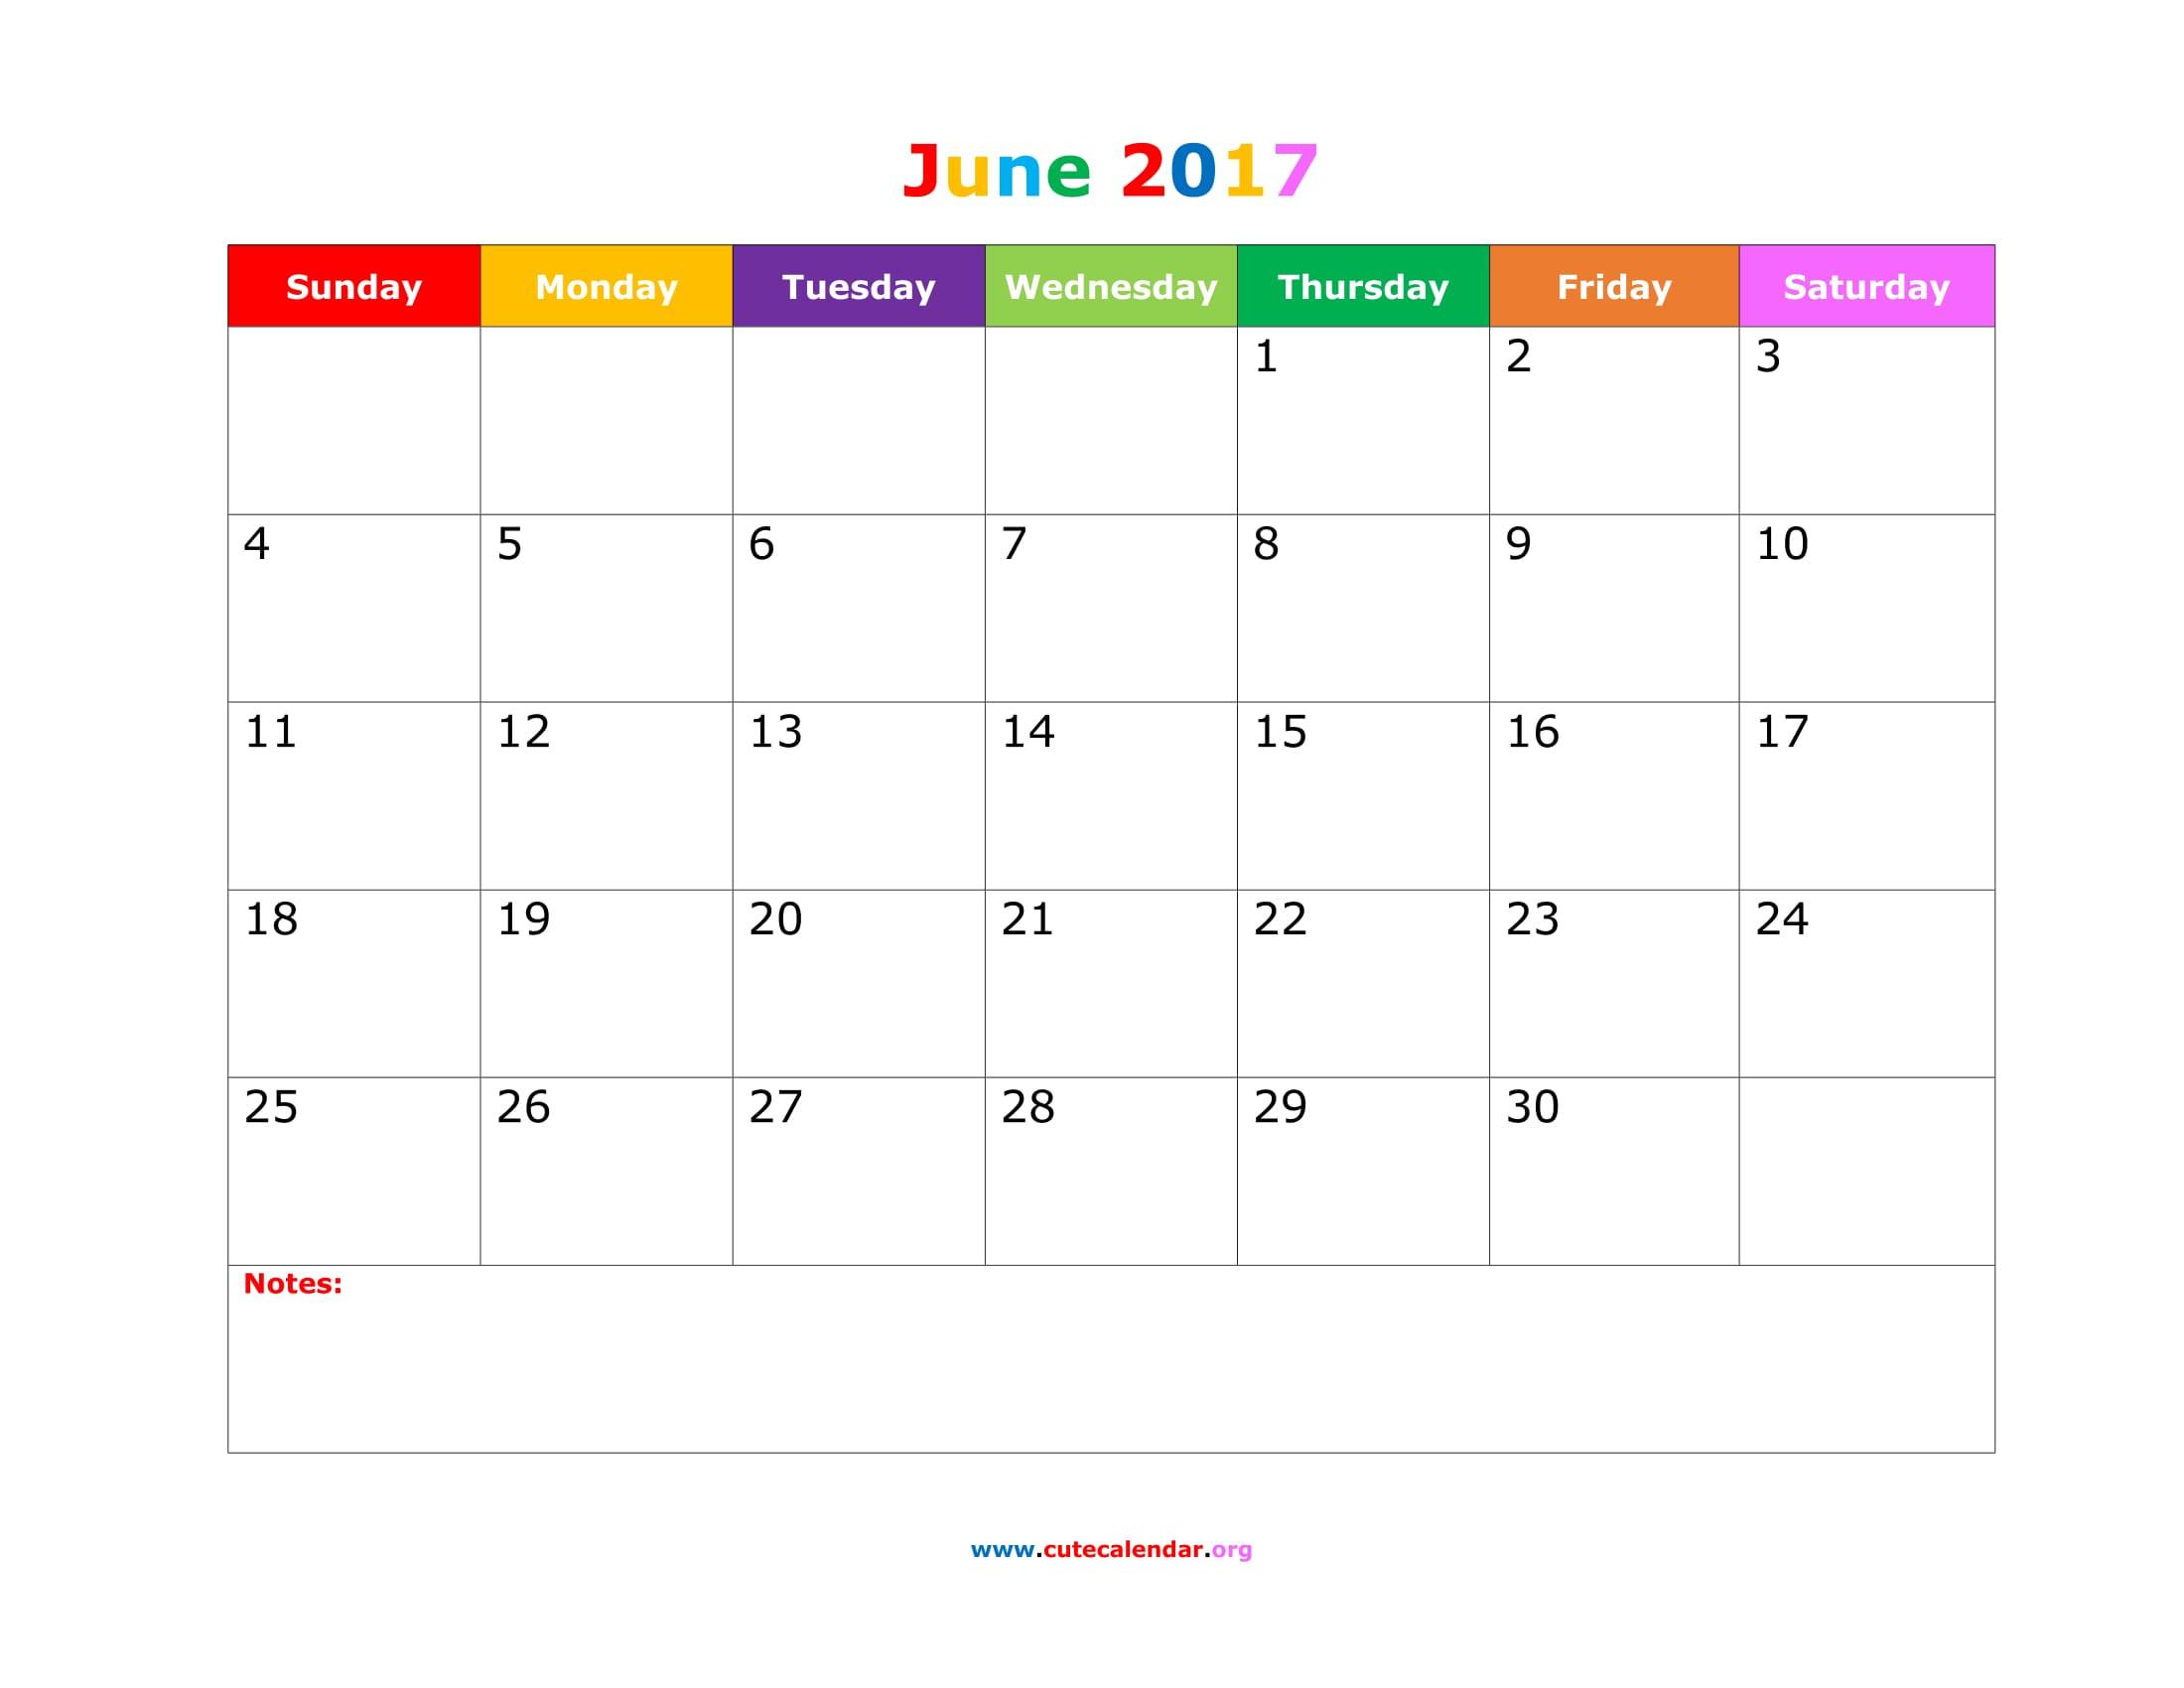 June 2017 Calendar Cute | 2017 calendar template